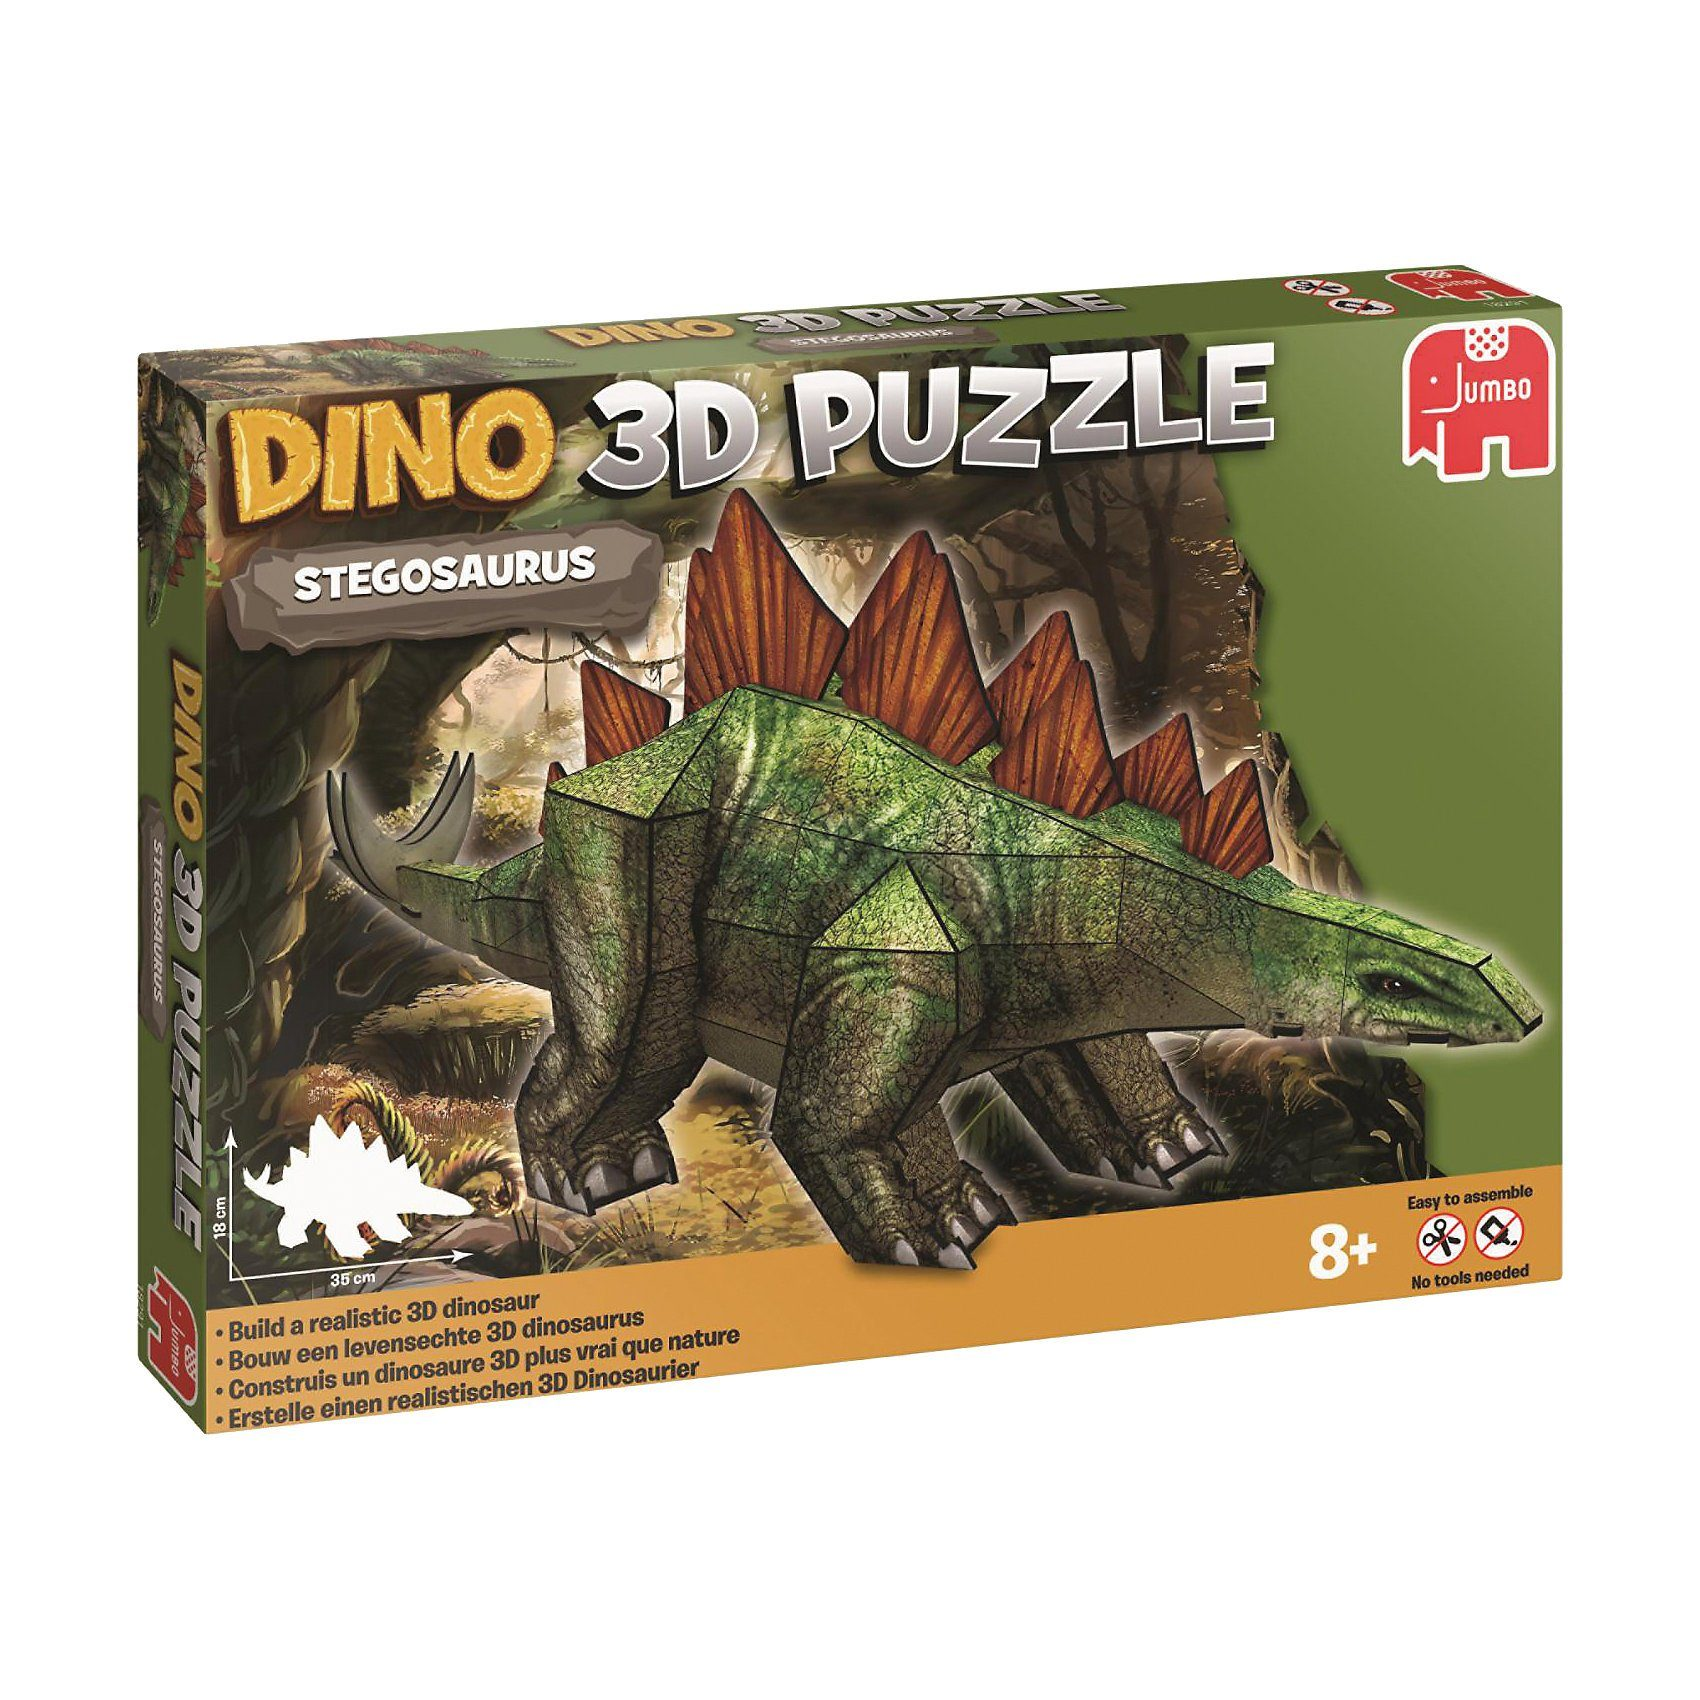 Jumbo 3D Dinosaurier Puzzle - 38 Teile - Stegosaurus